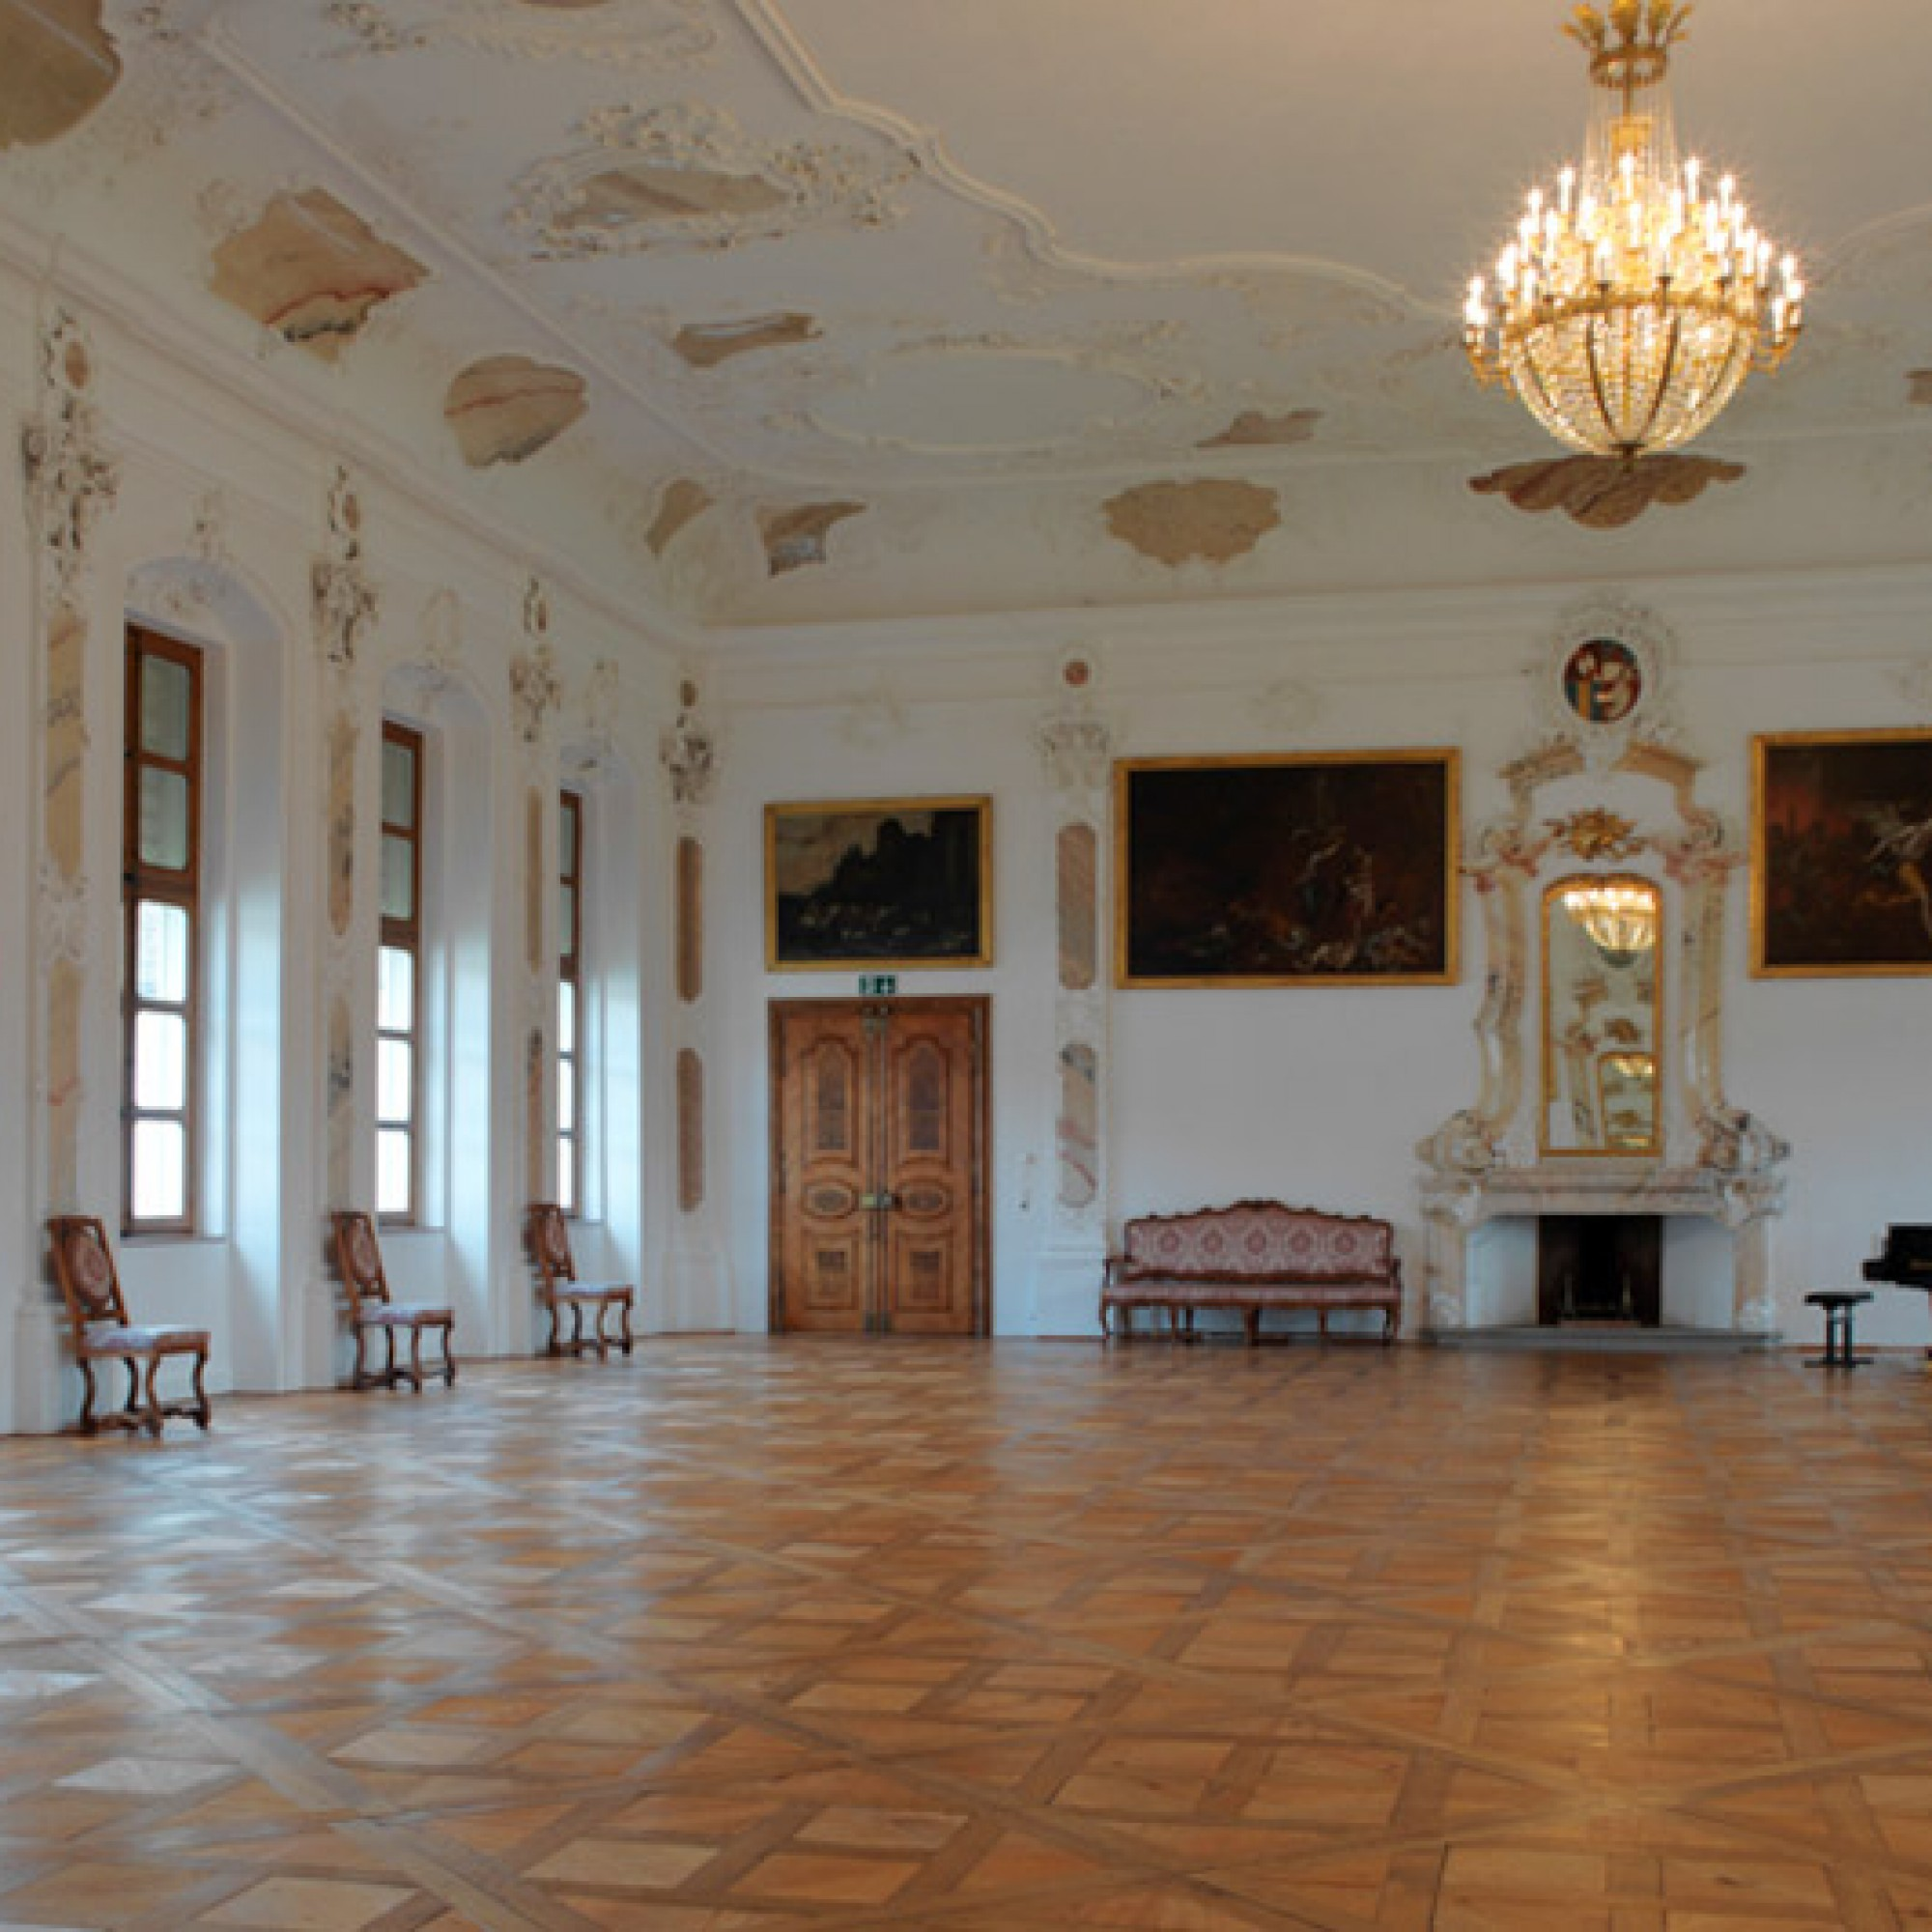 Barocke Pracht im Festsaal des Klosters. (Margherita Delussu, Luzern)